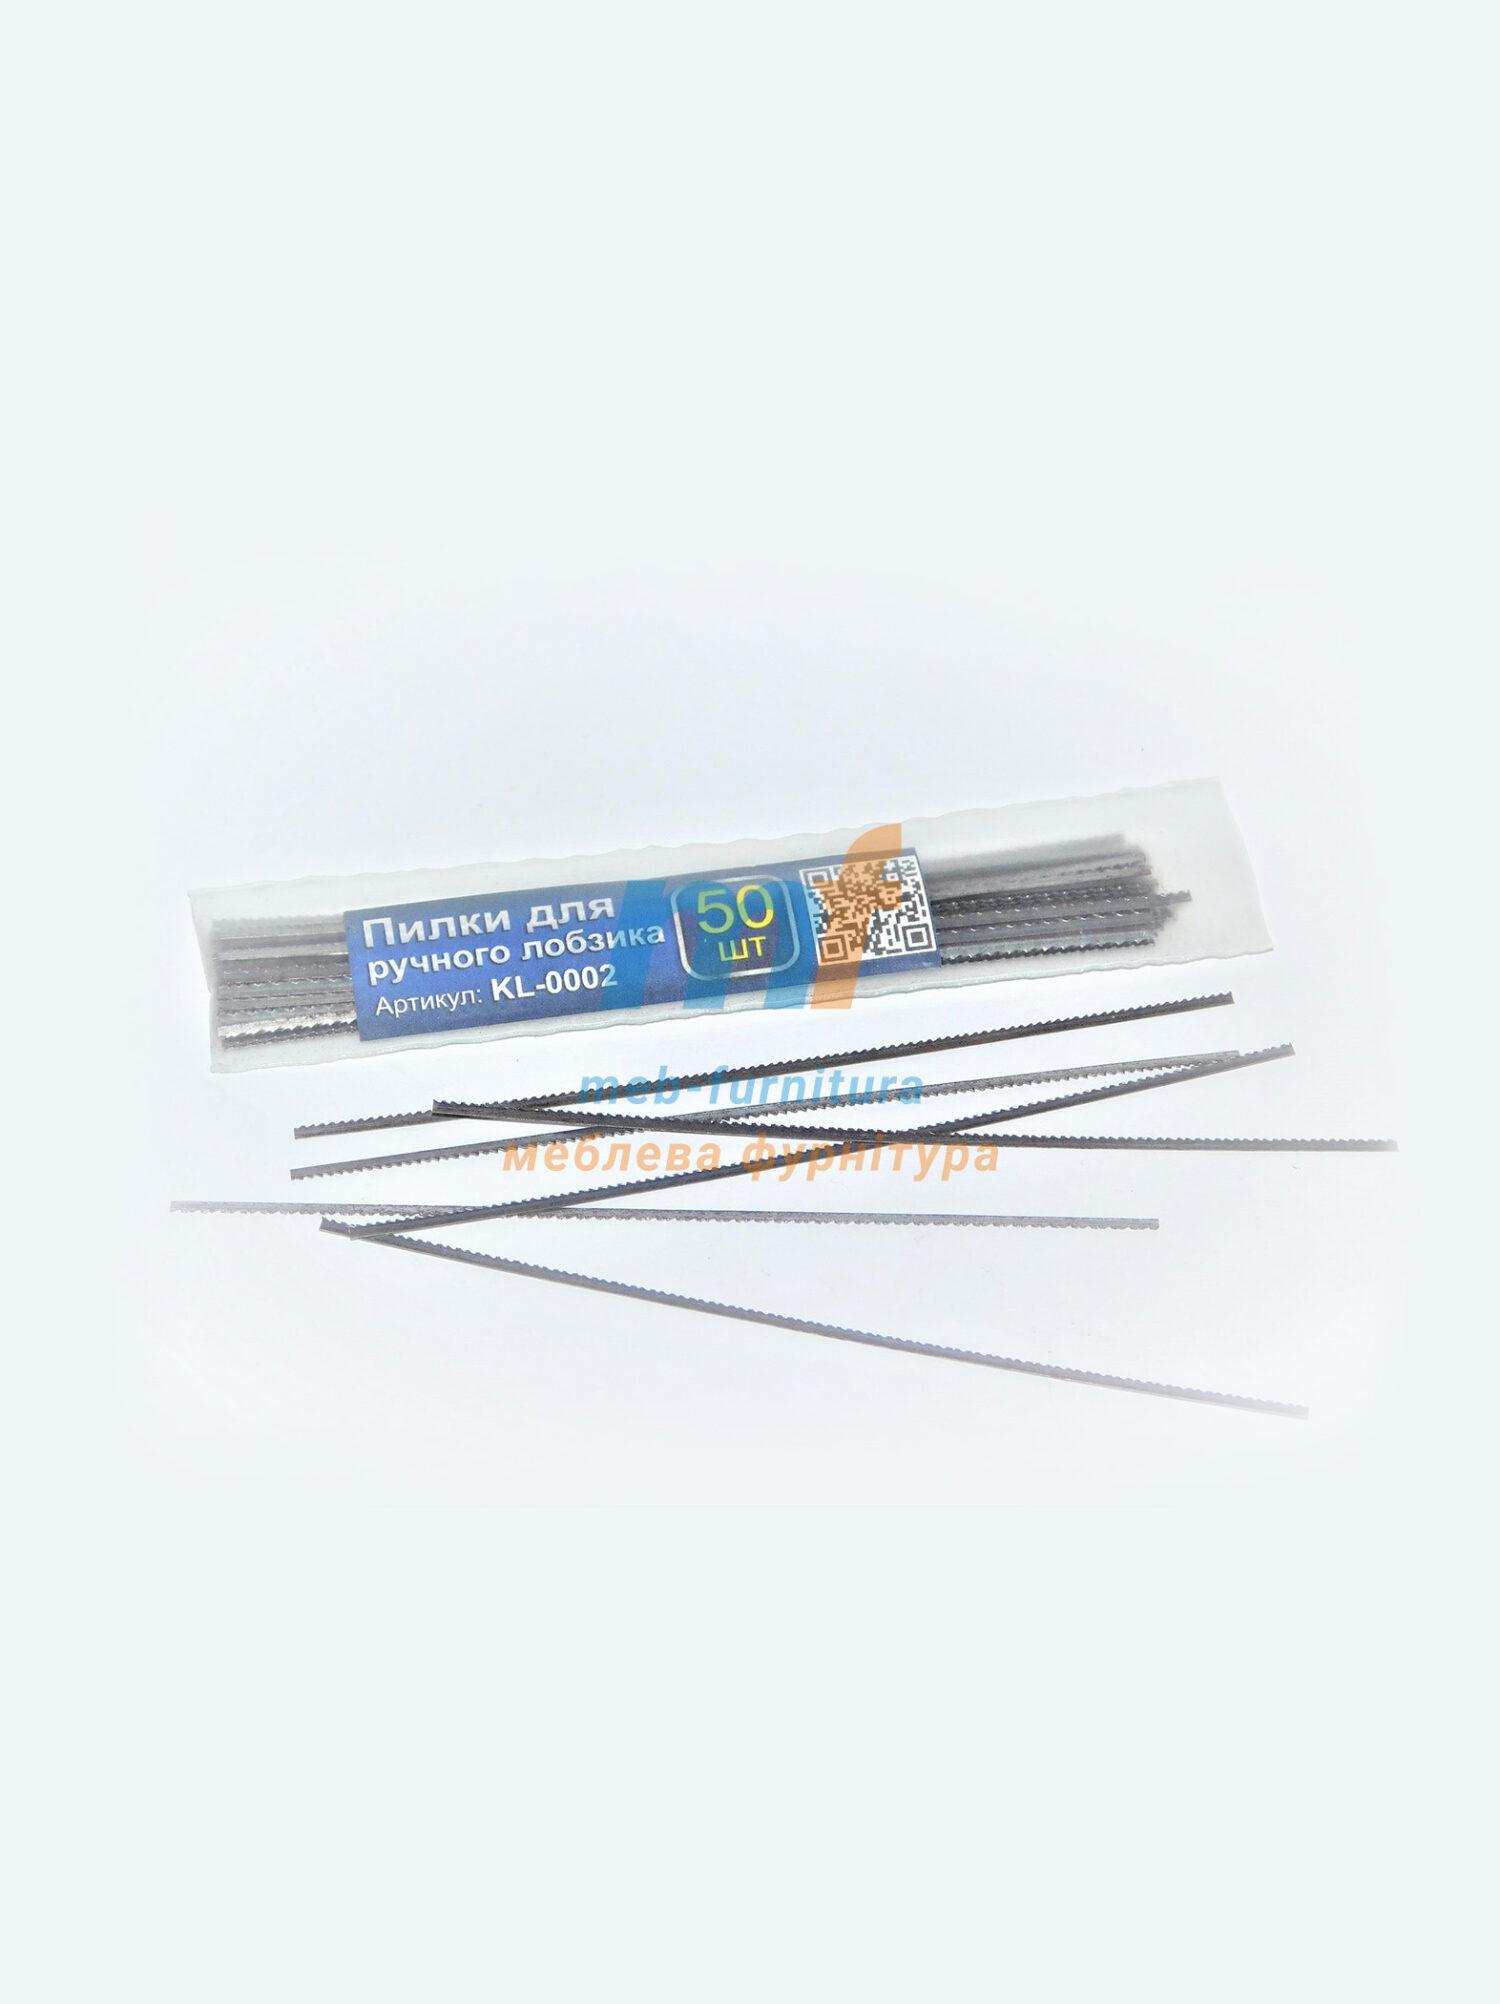 Пилочки для ручного лобзика